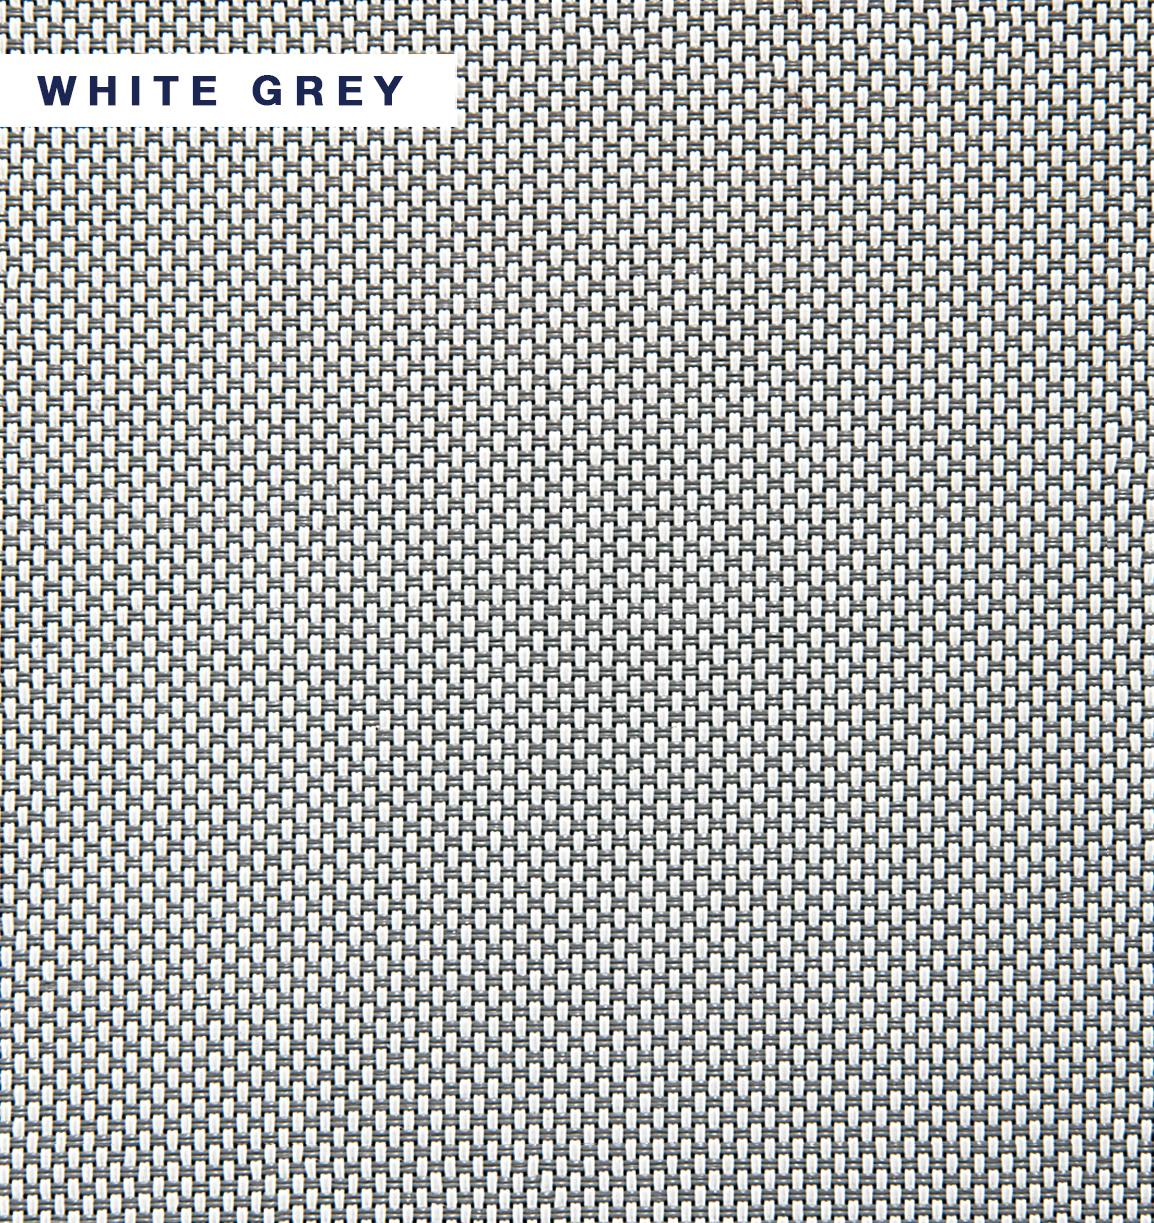 SW4510 - White Grey.jpg